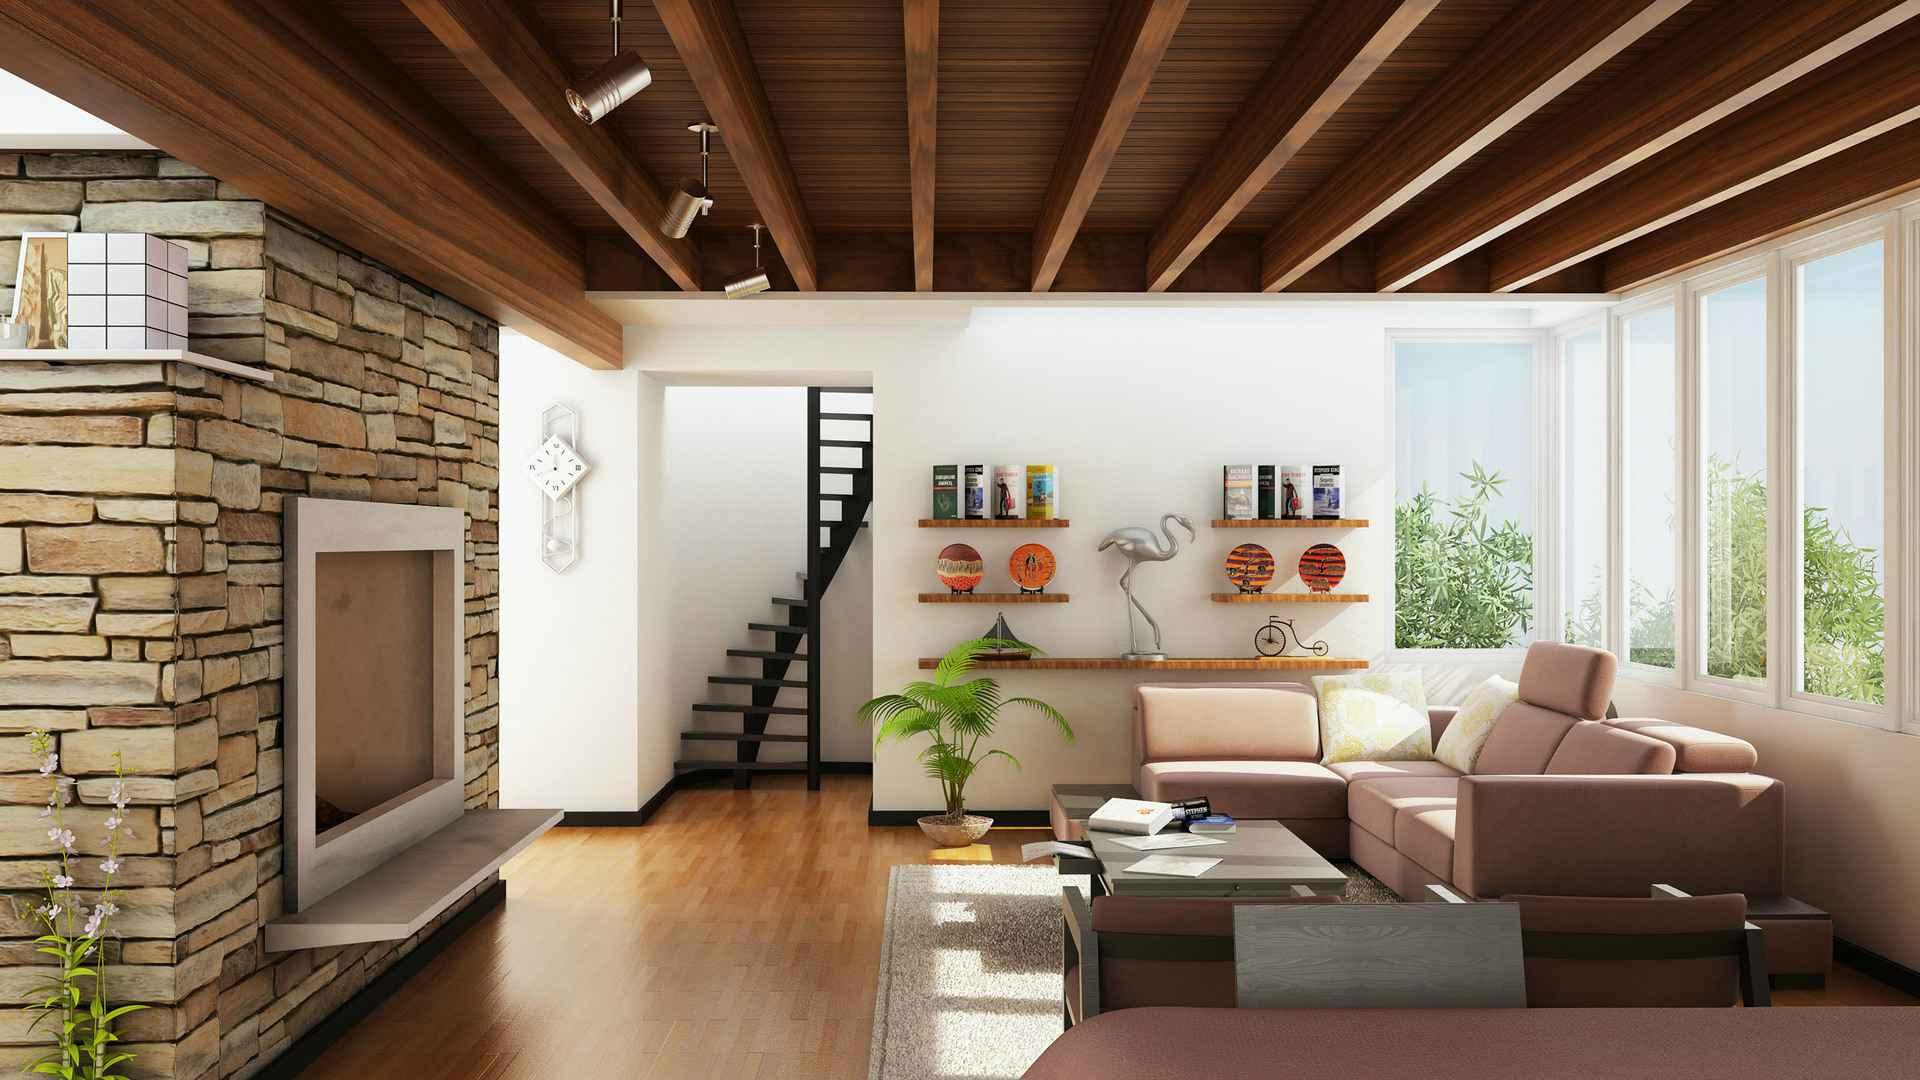 House furnishing styles furnishing styles paperistic minimalistic design your home SYYITGA